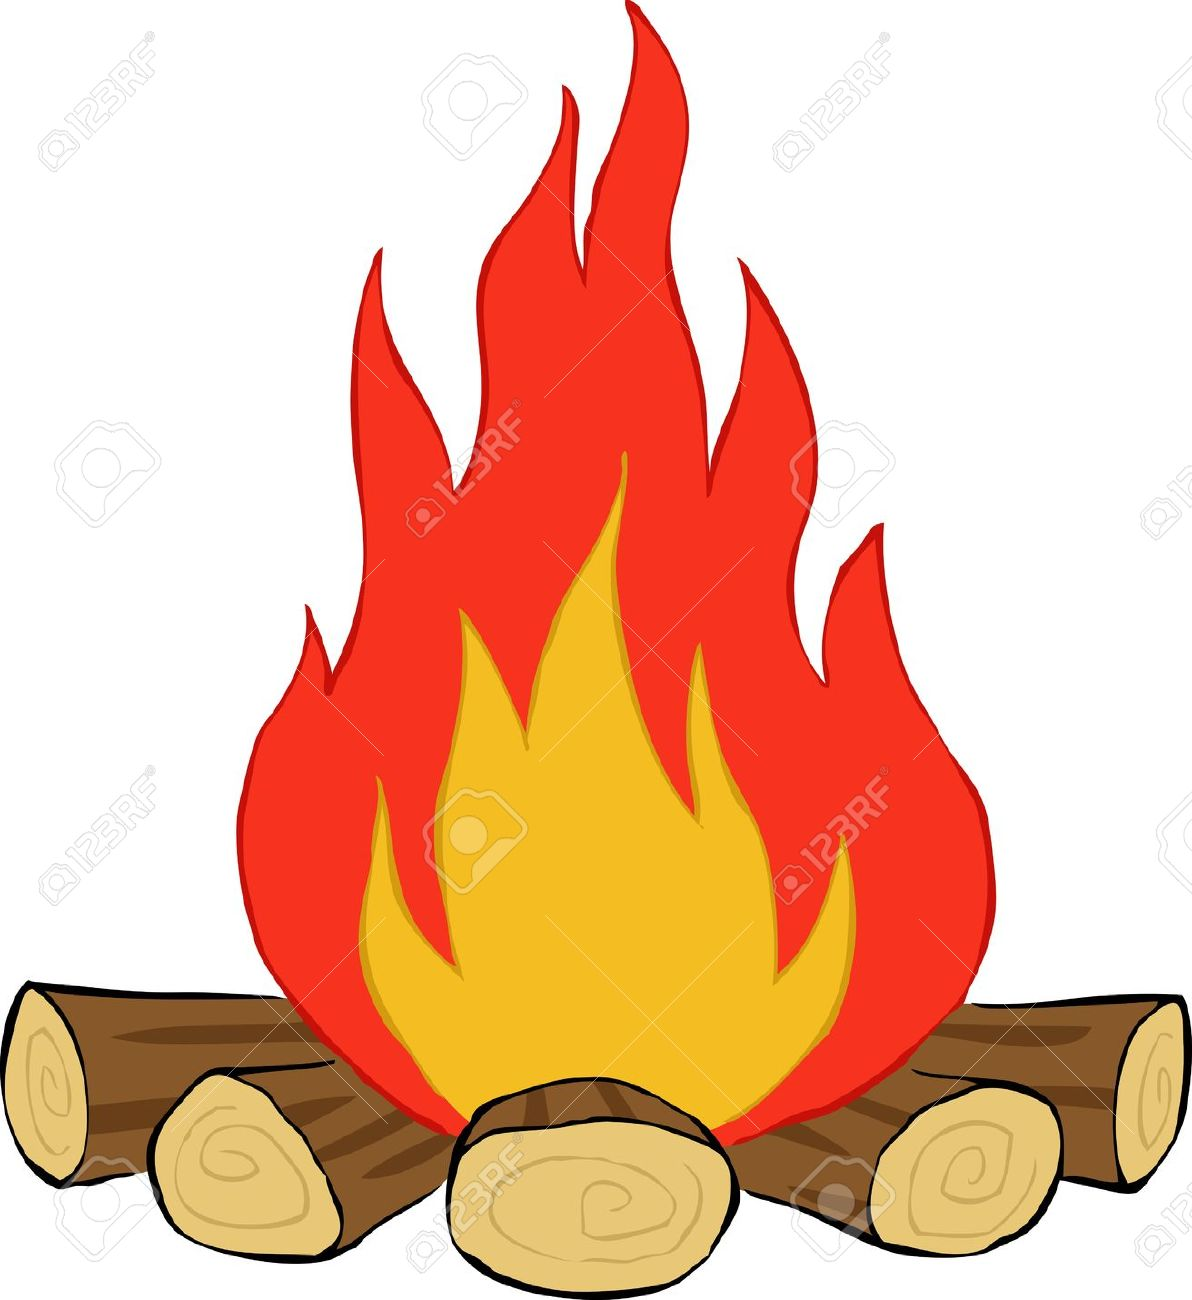 Fire Cartoon Image.